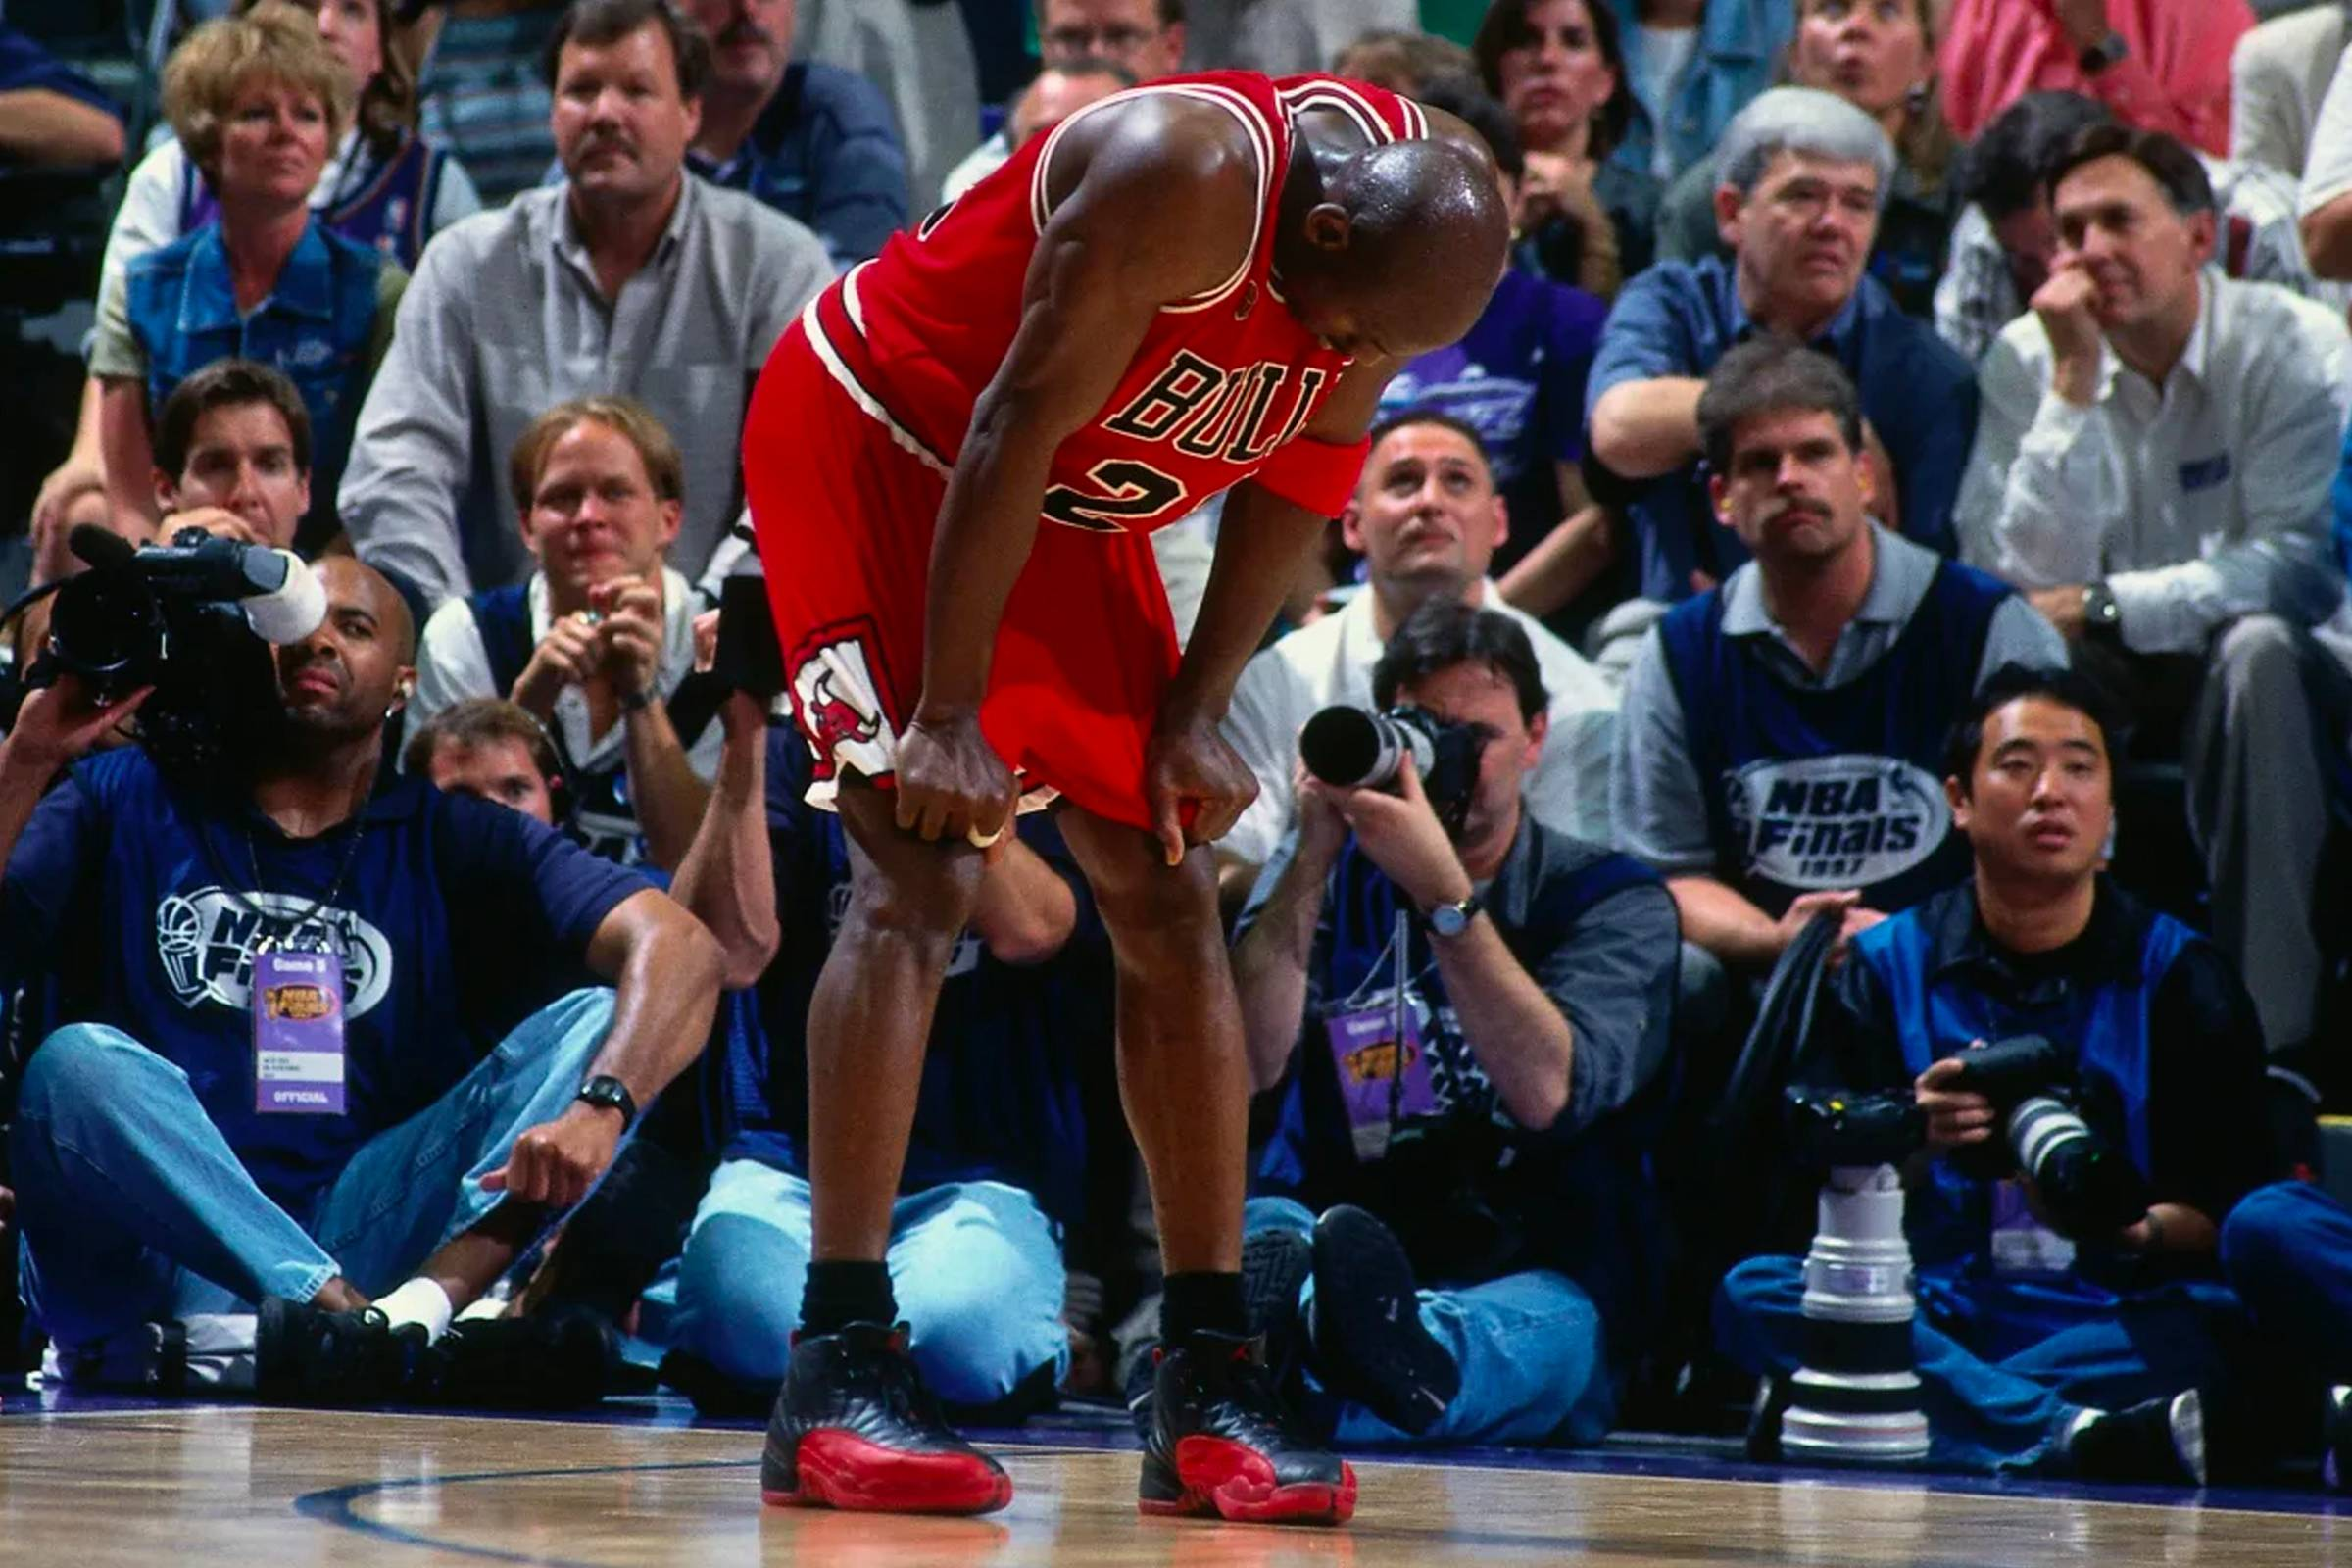 1997 NBA Finals, Game 5